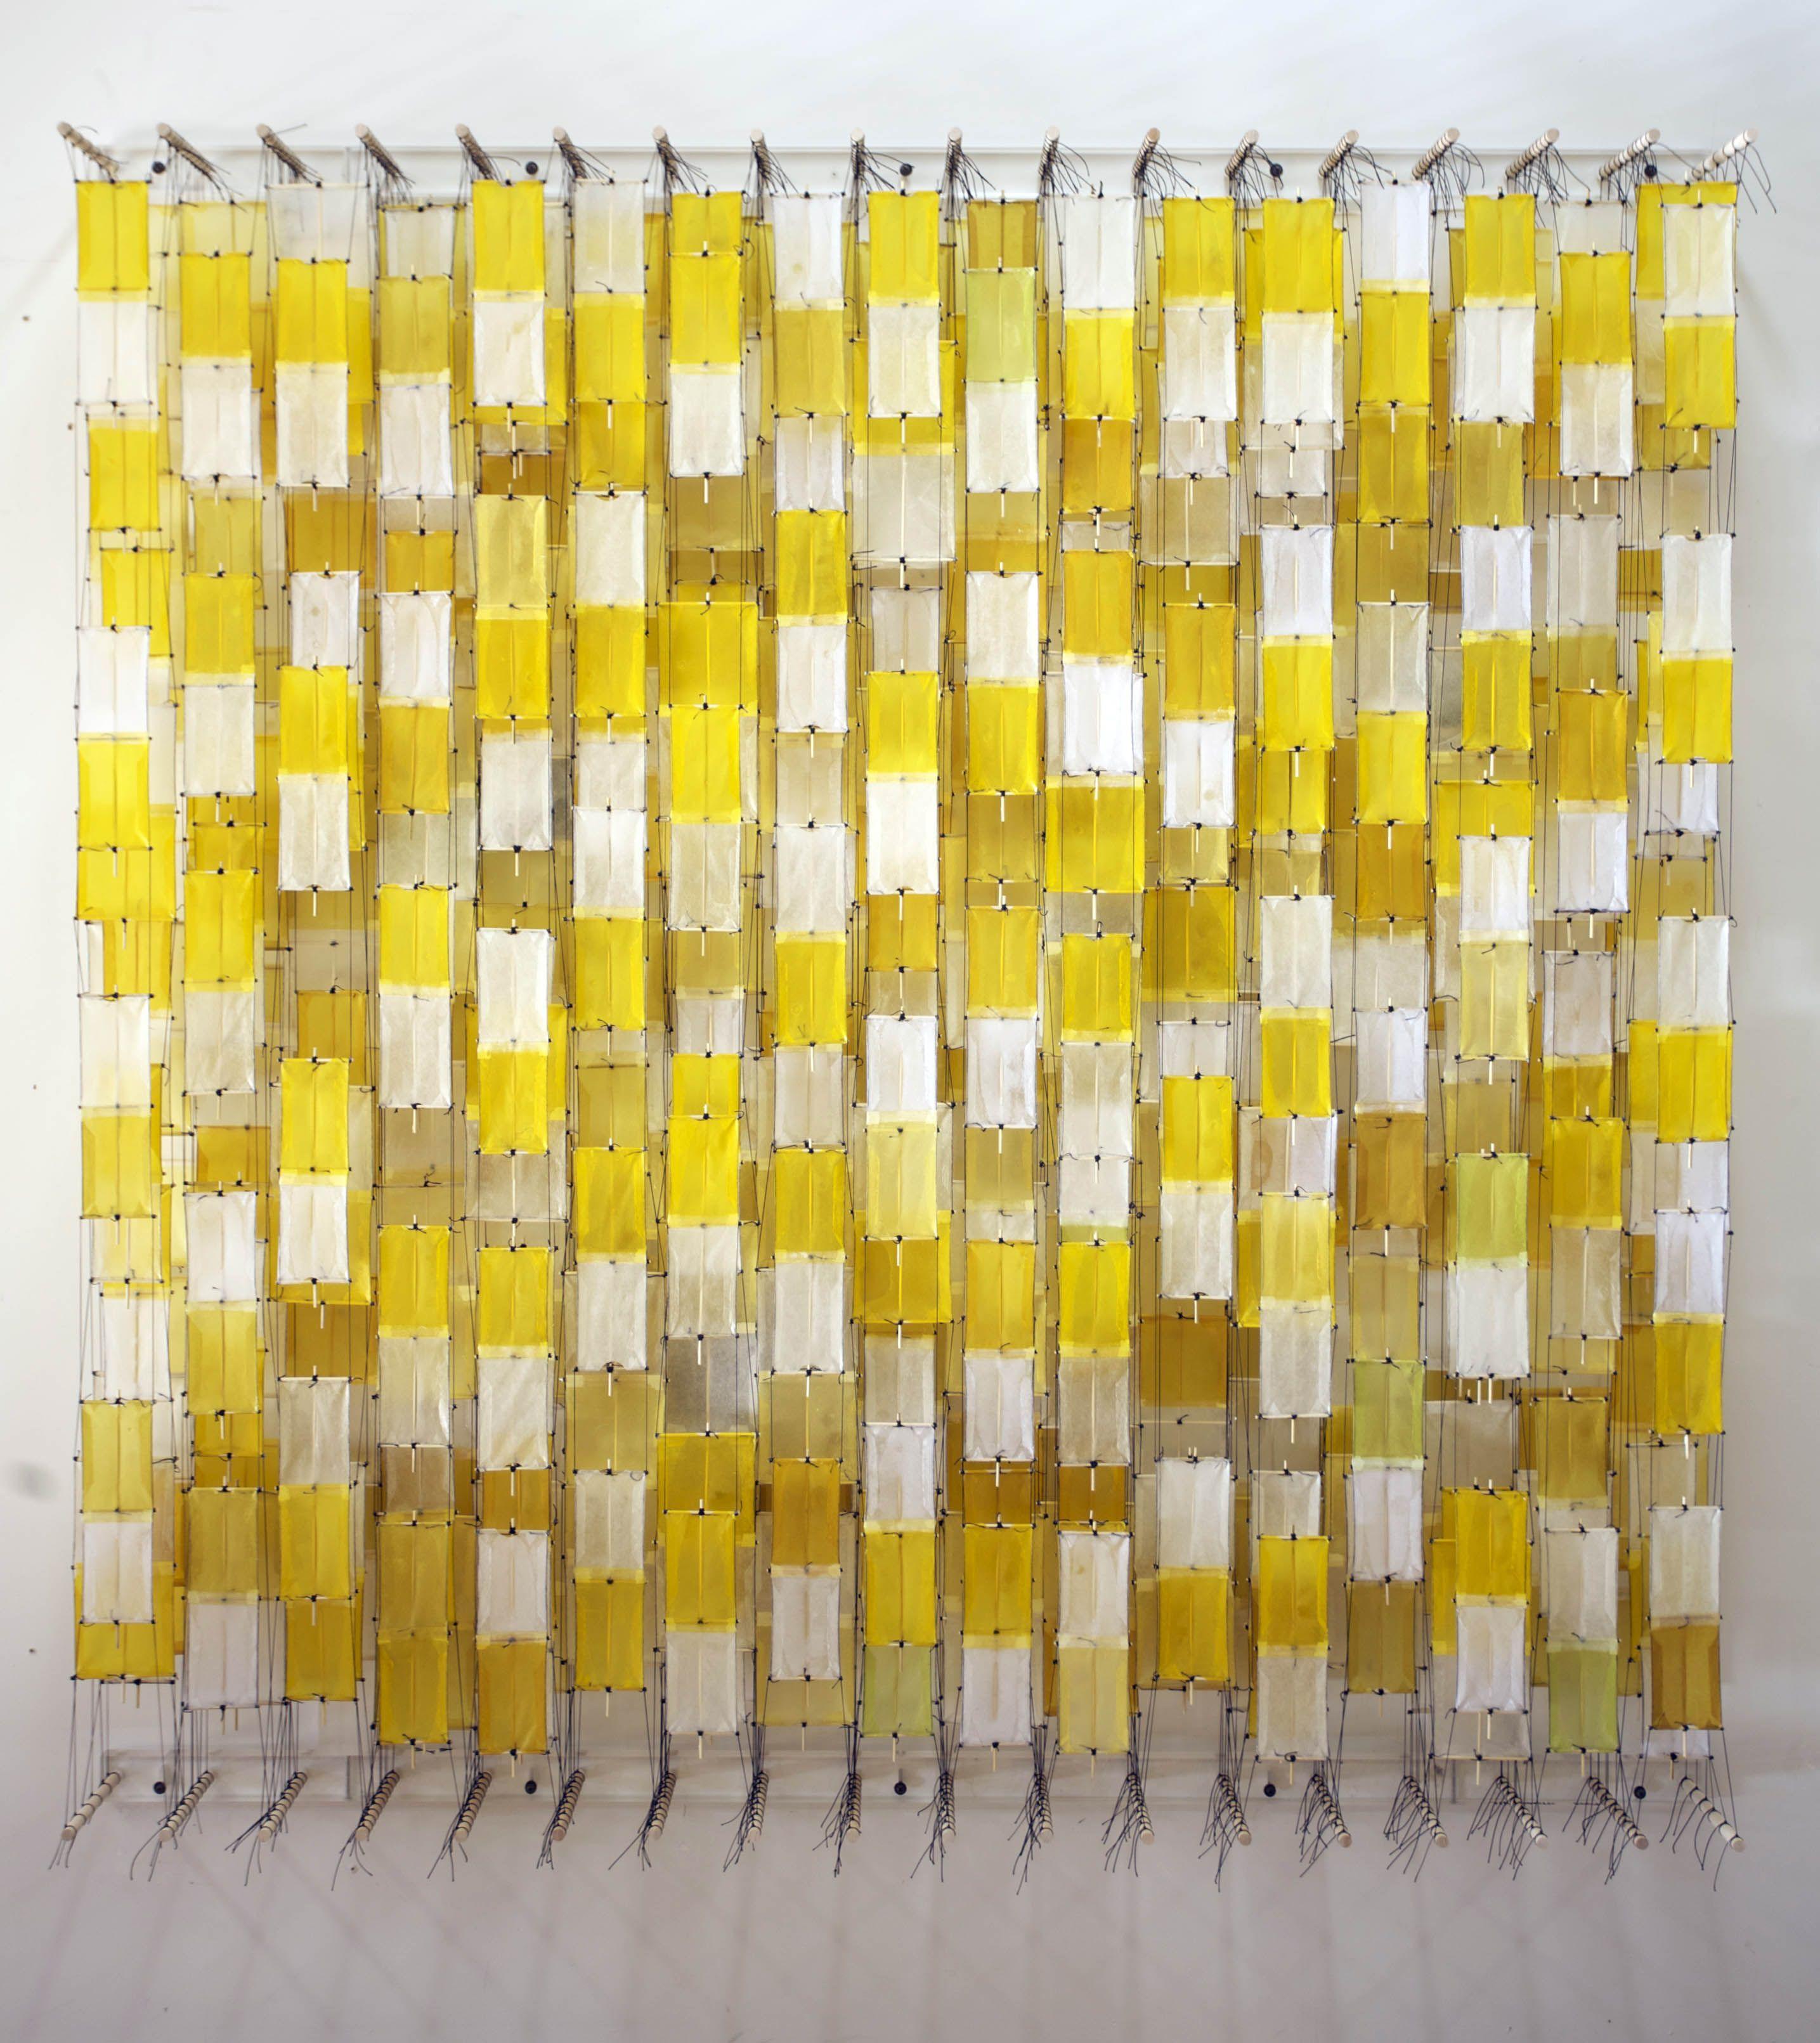 Jacob Hashimoto, field of yellow blocks. | jacob hashimoto ...